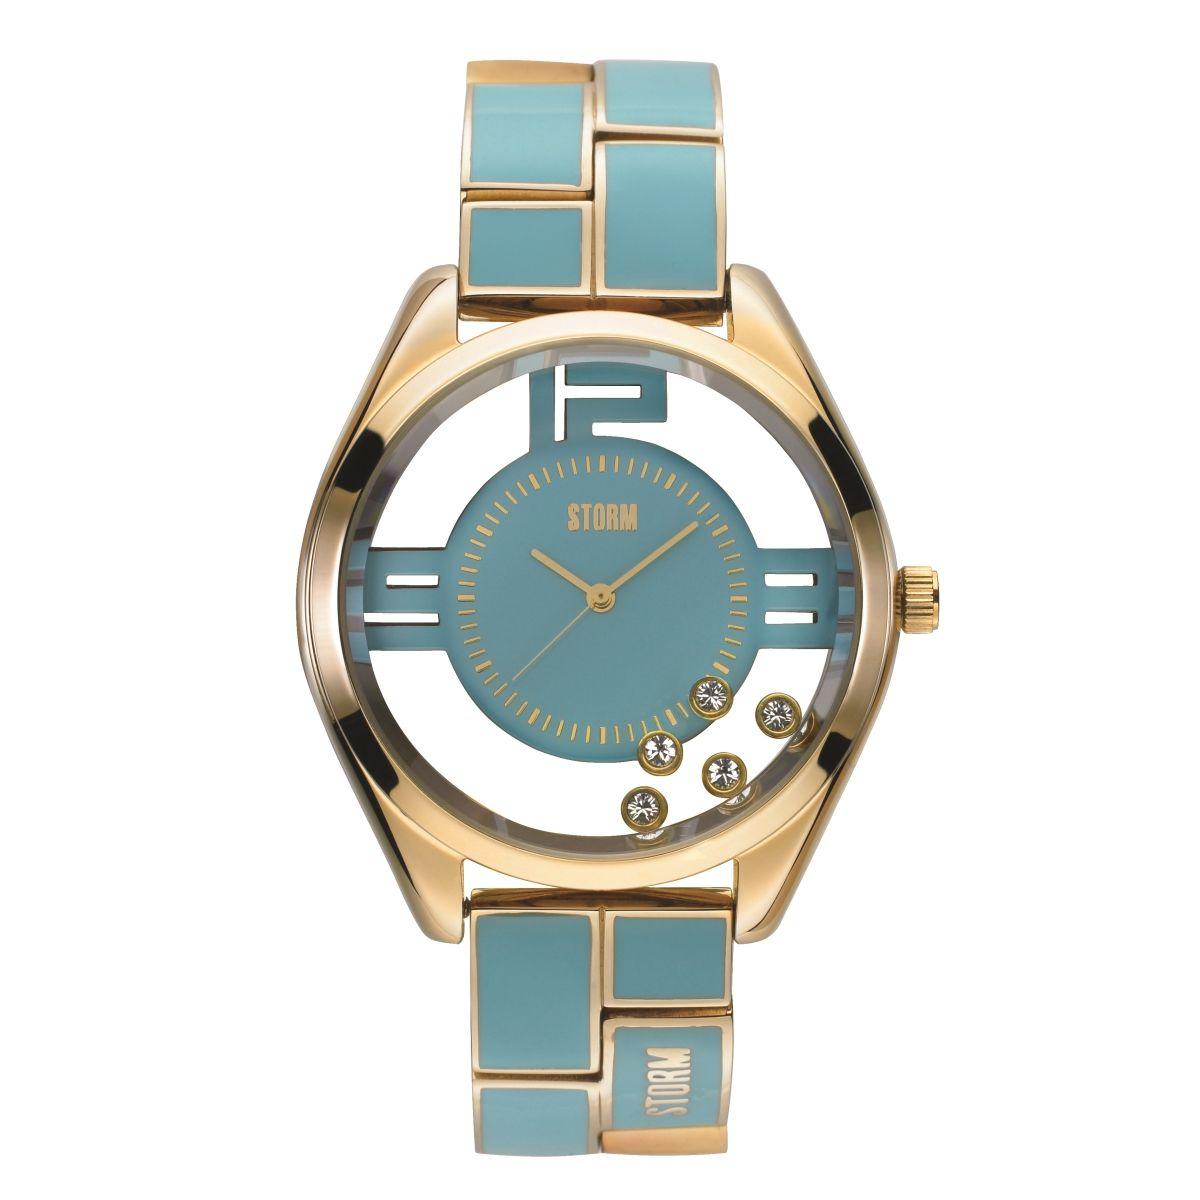 STORM London שעון לאישה דגם Pizaz - כחול ים